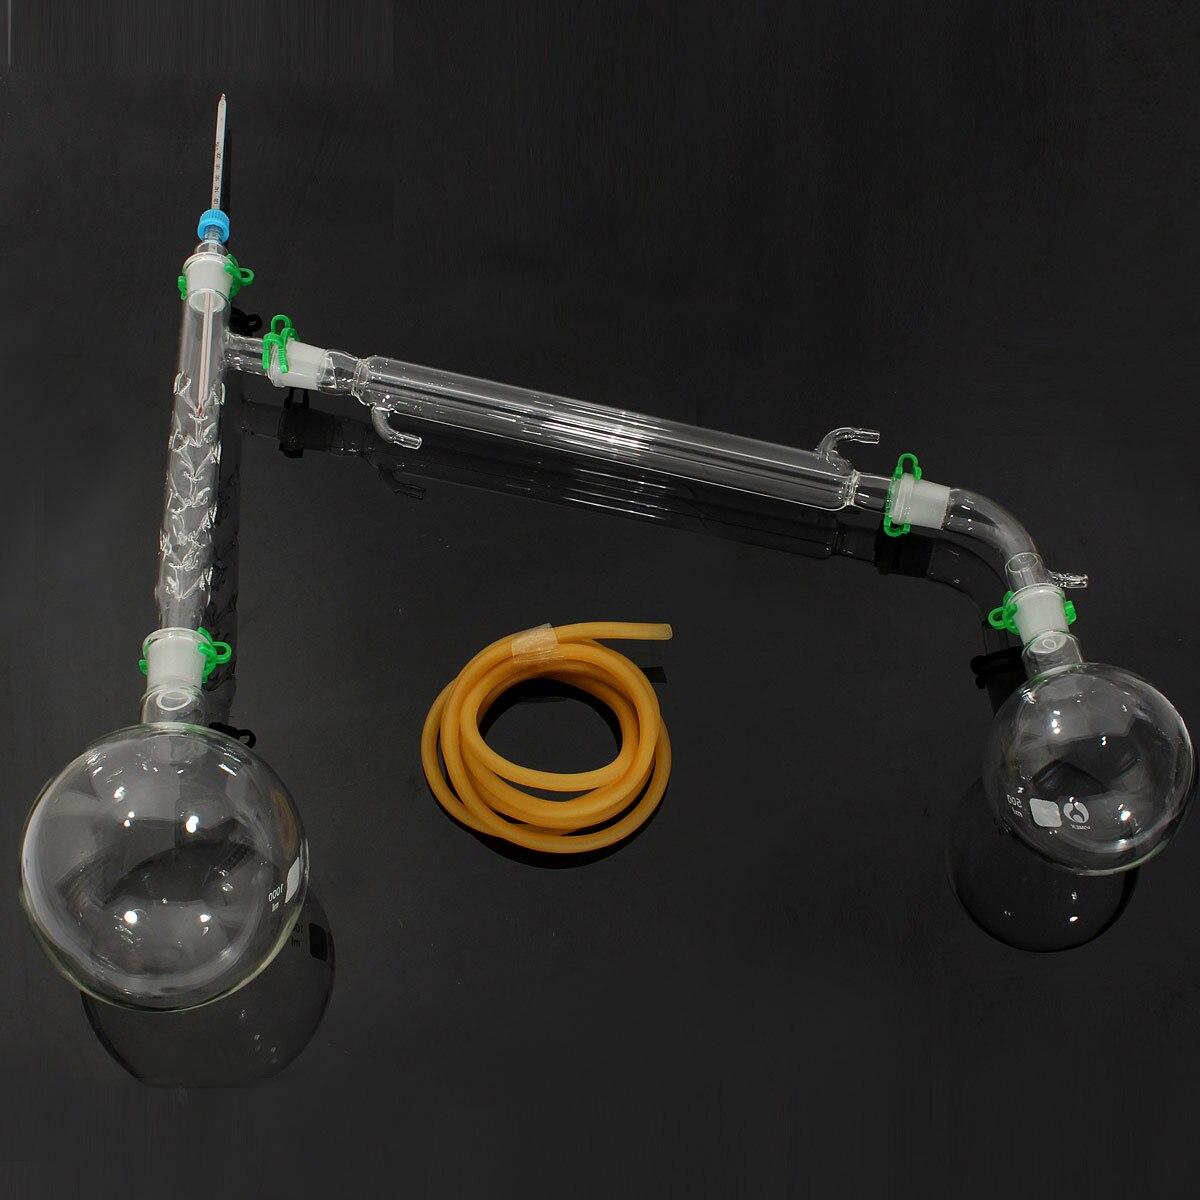 1000ml appareil de Distillation laboratoire chimie verrerie Kit ensemble chimie laboratoire verre Distillation appareil de Distillation 24/29